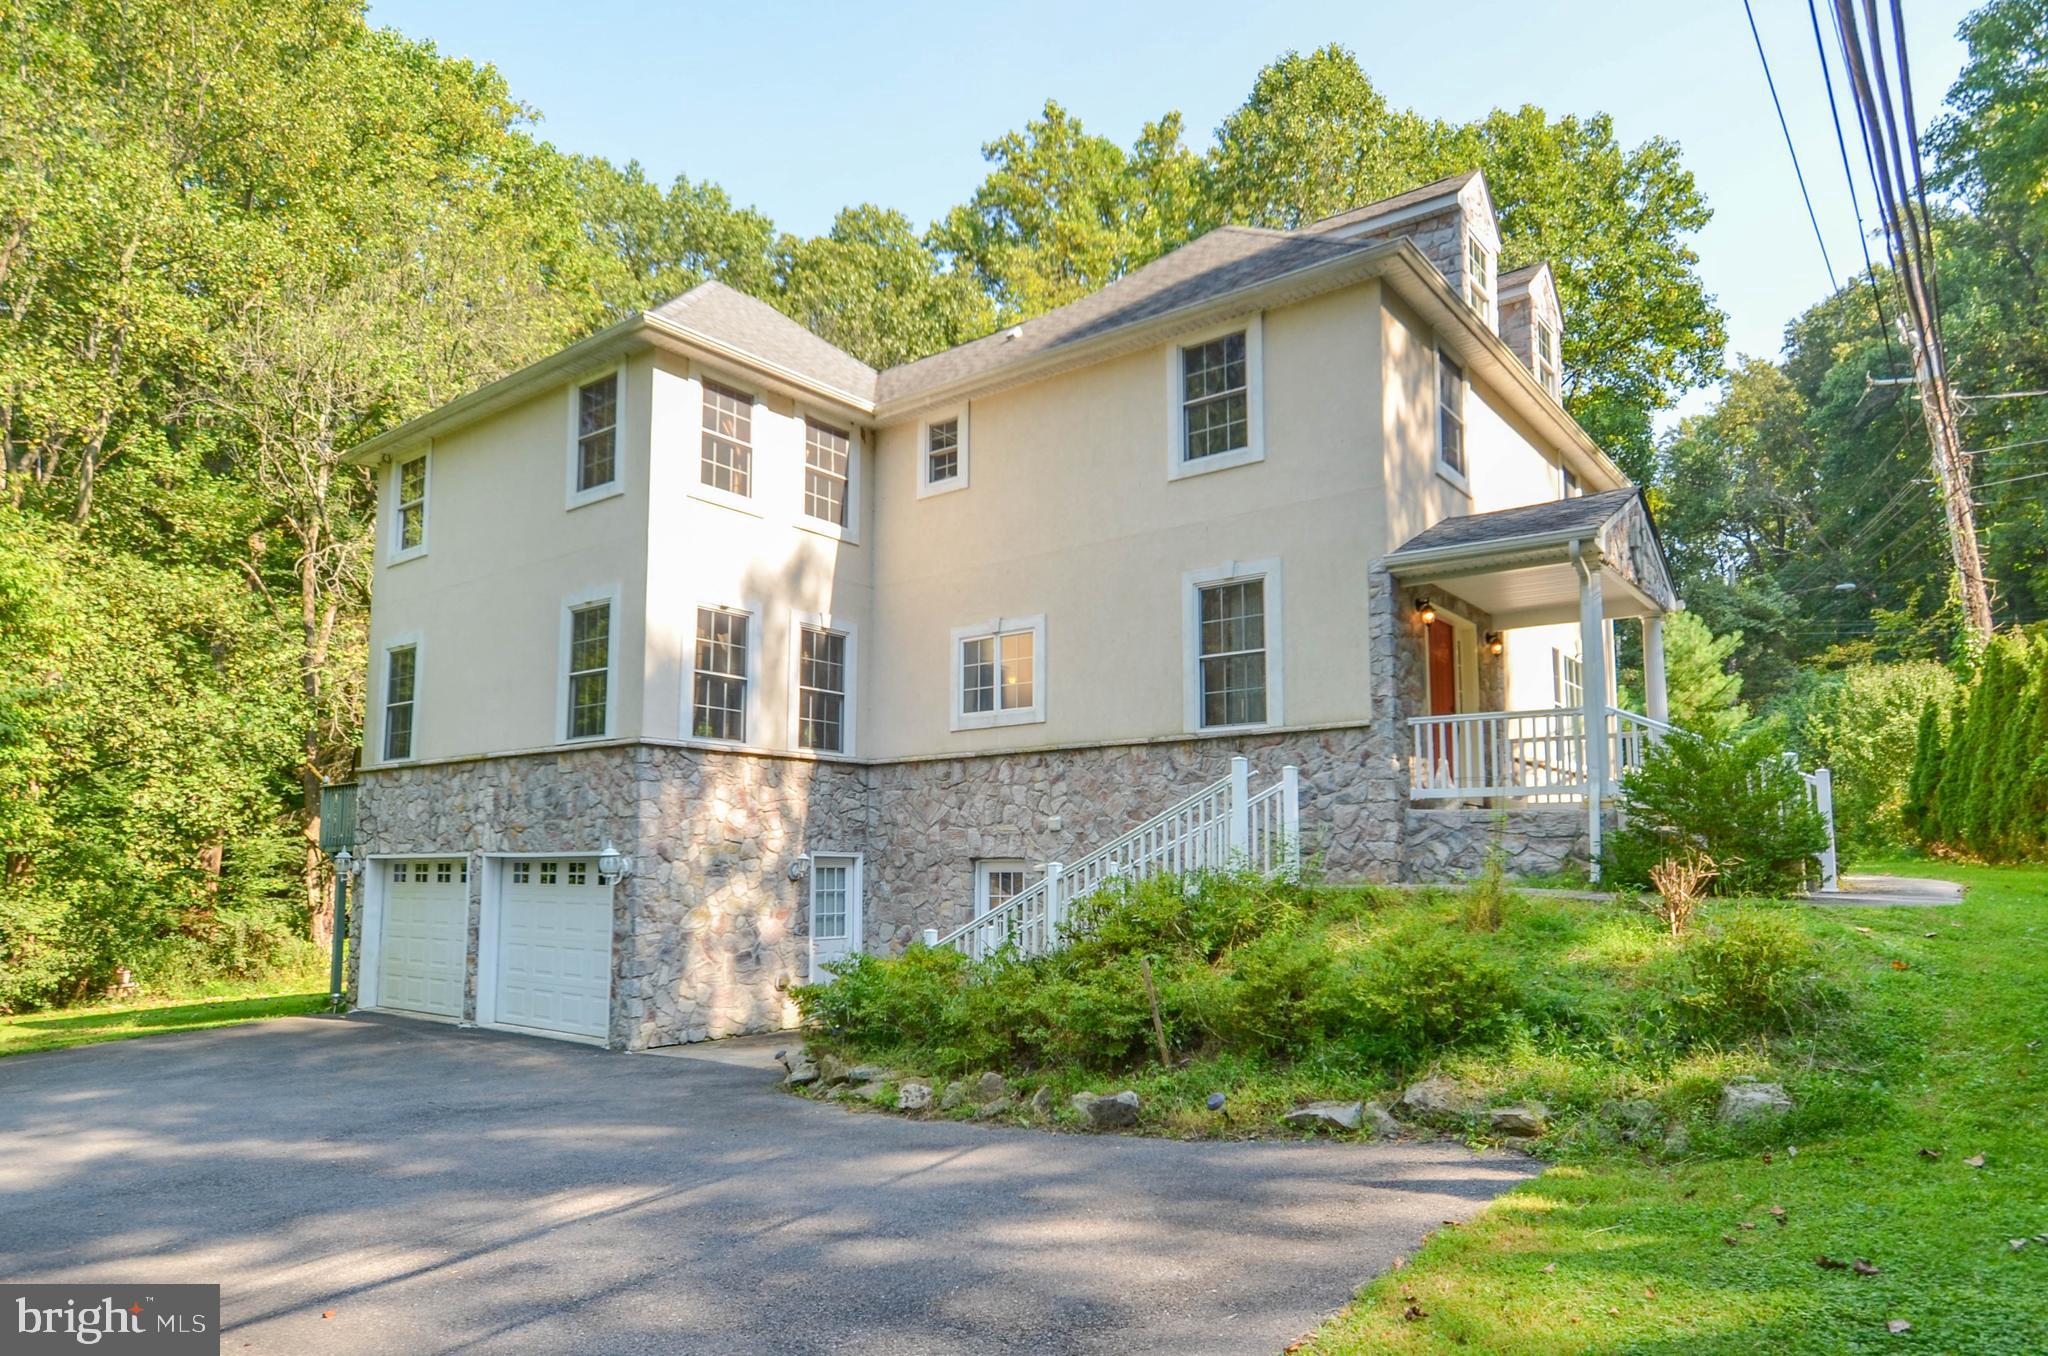 2249 HONEYSUCKLE ROAD, Allentown, Pennsylvania 18103, 5 Bedrooms Bedrooms, ,5 BathroomsBathrooms,Single Family,For Sale,2249 HONEYSUCKLE ROAD,PALH115920